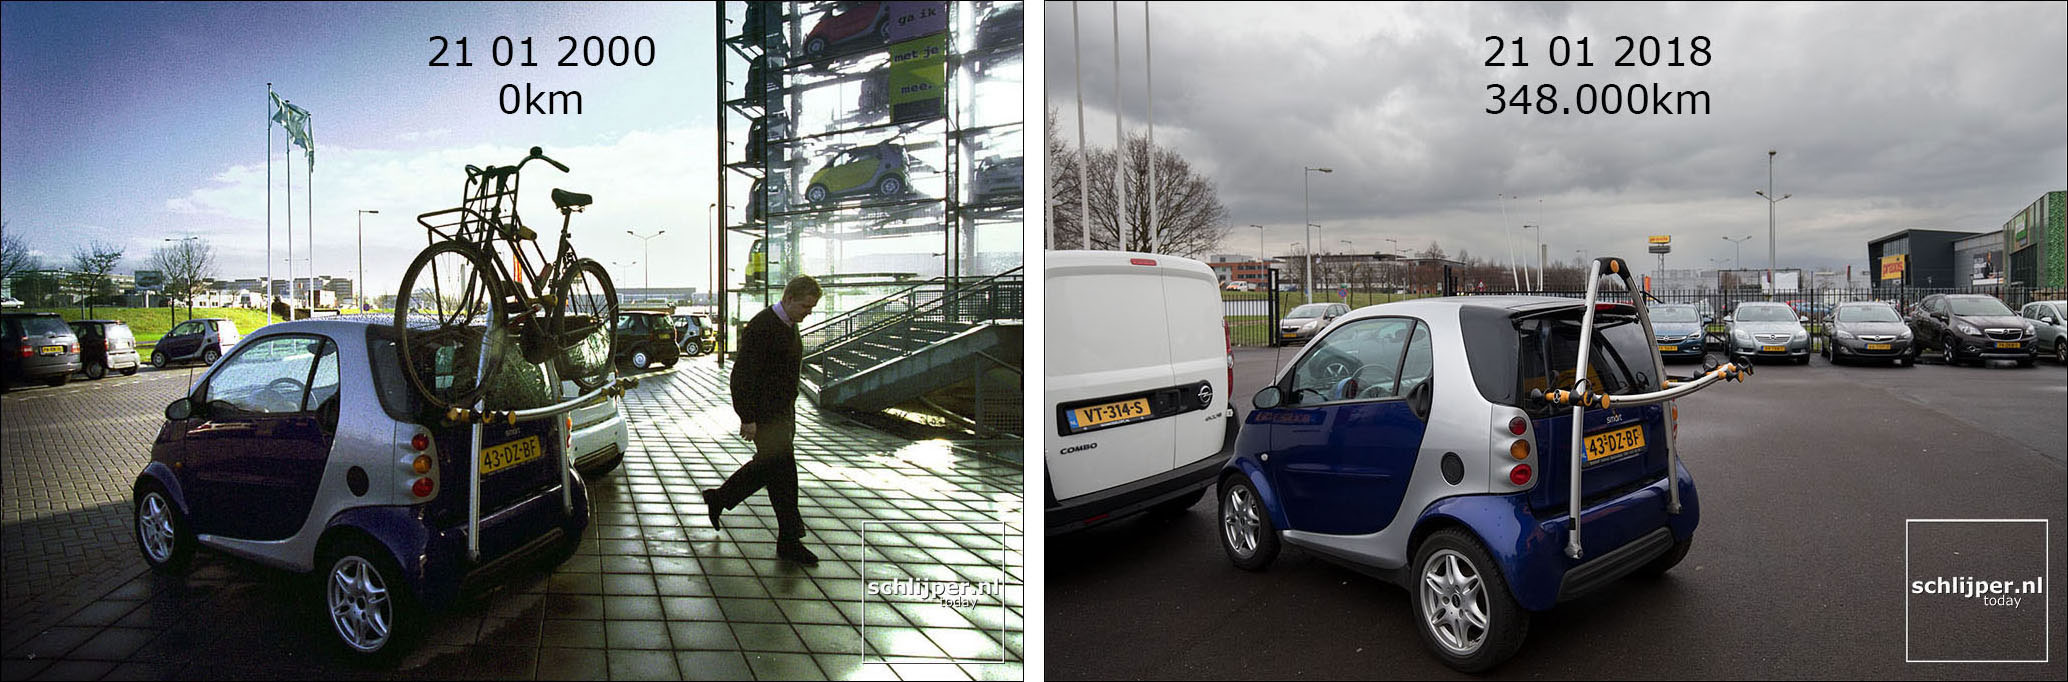 Nederland, Amsterdam, 21 januari 2000 + 21 januari 2018